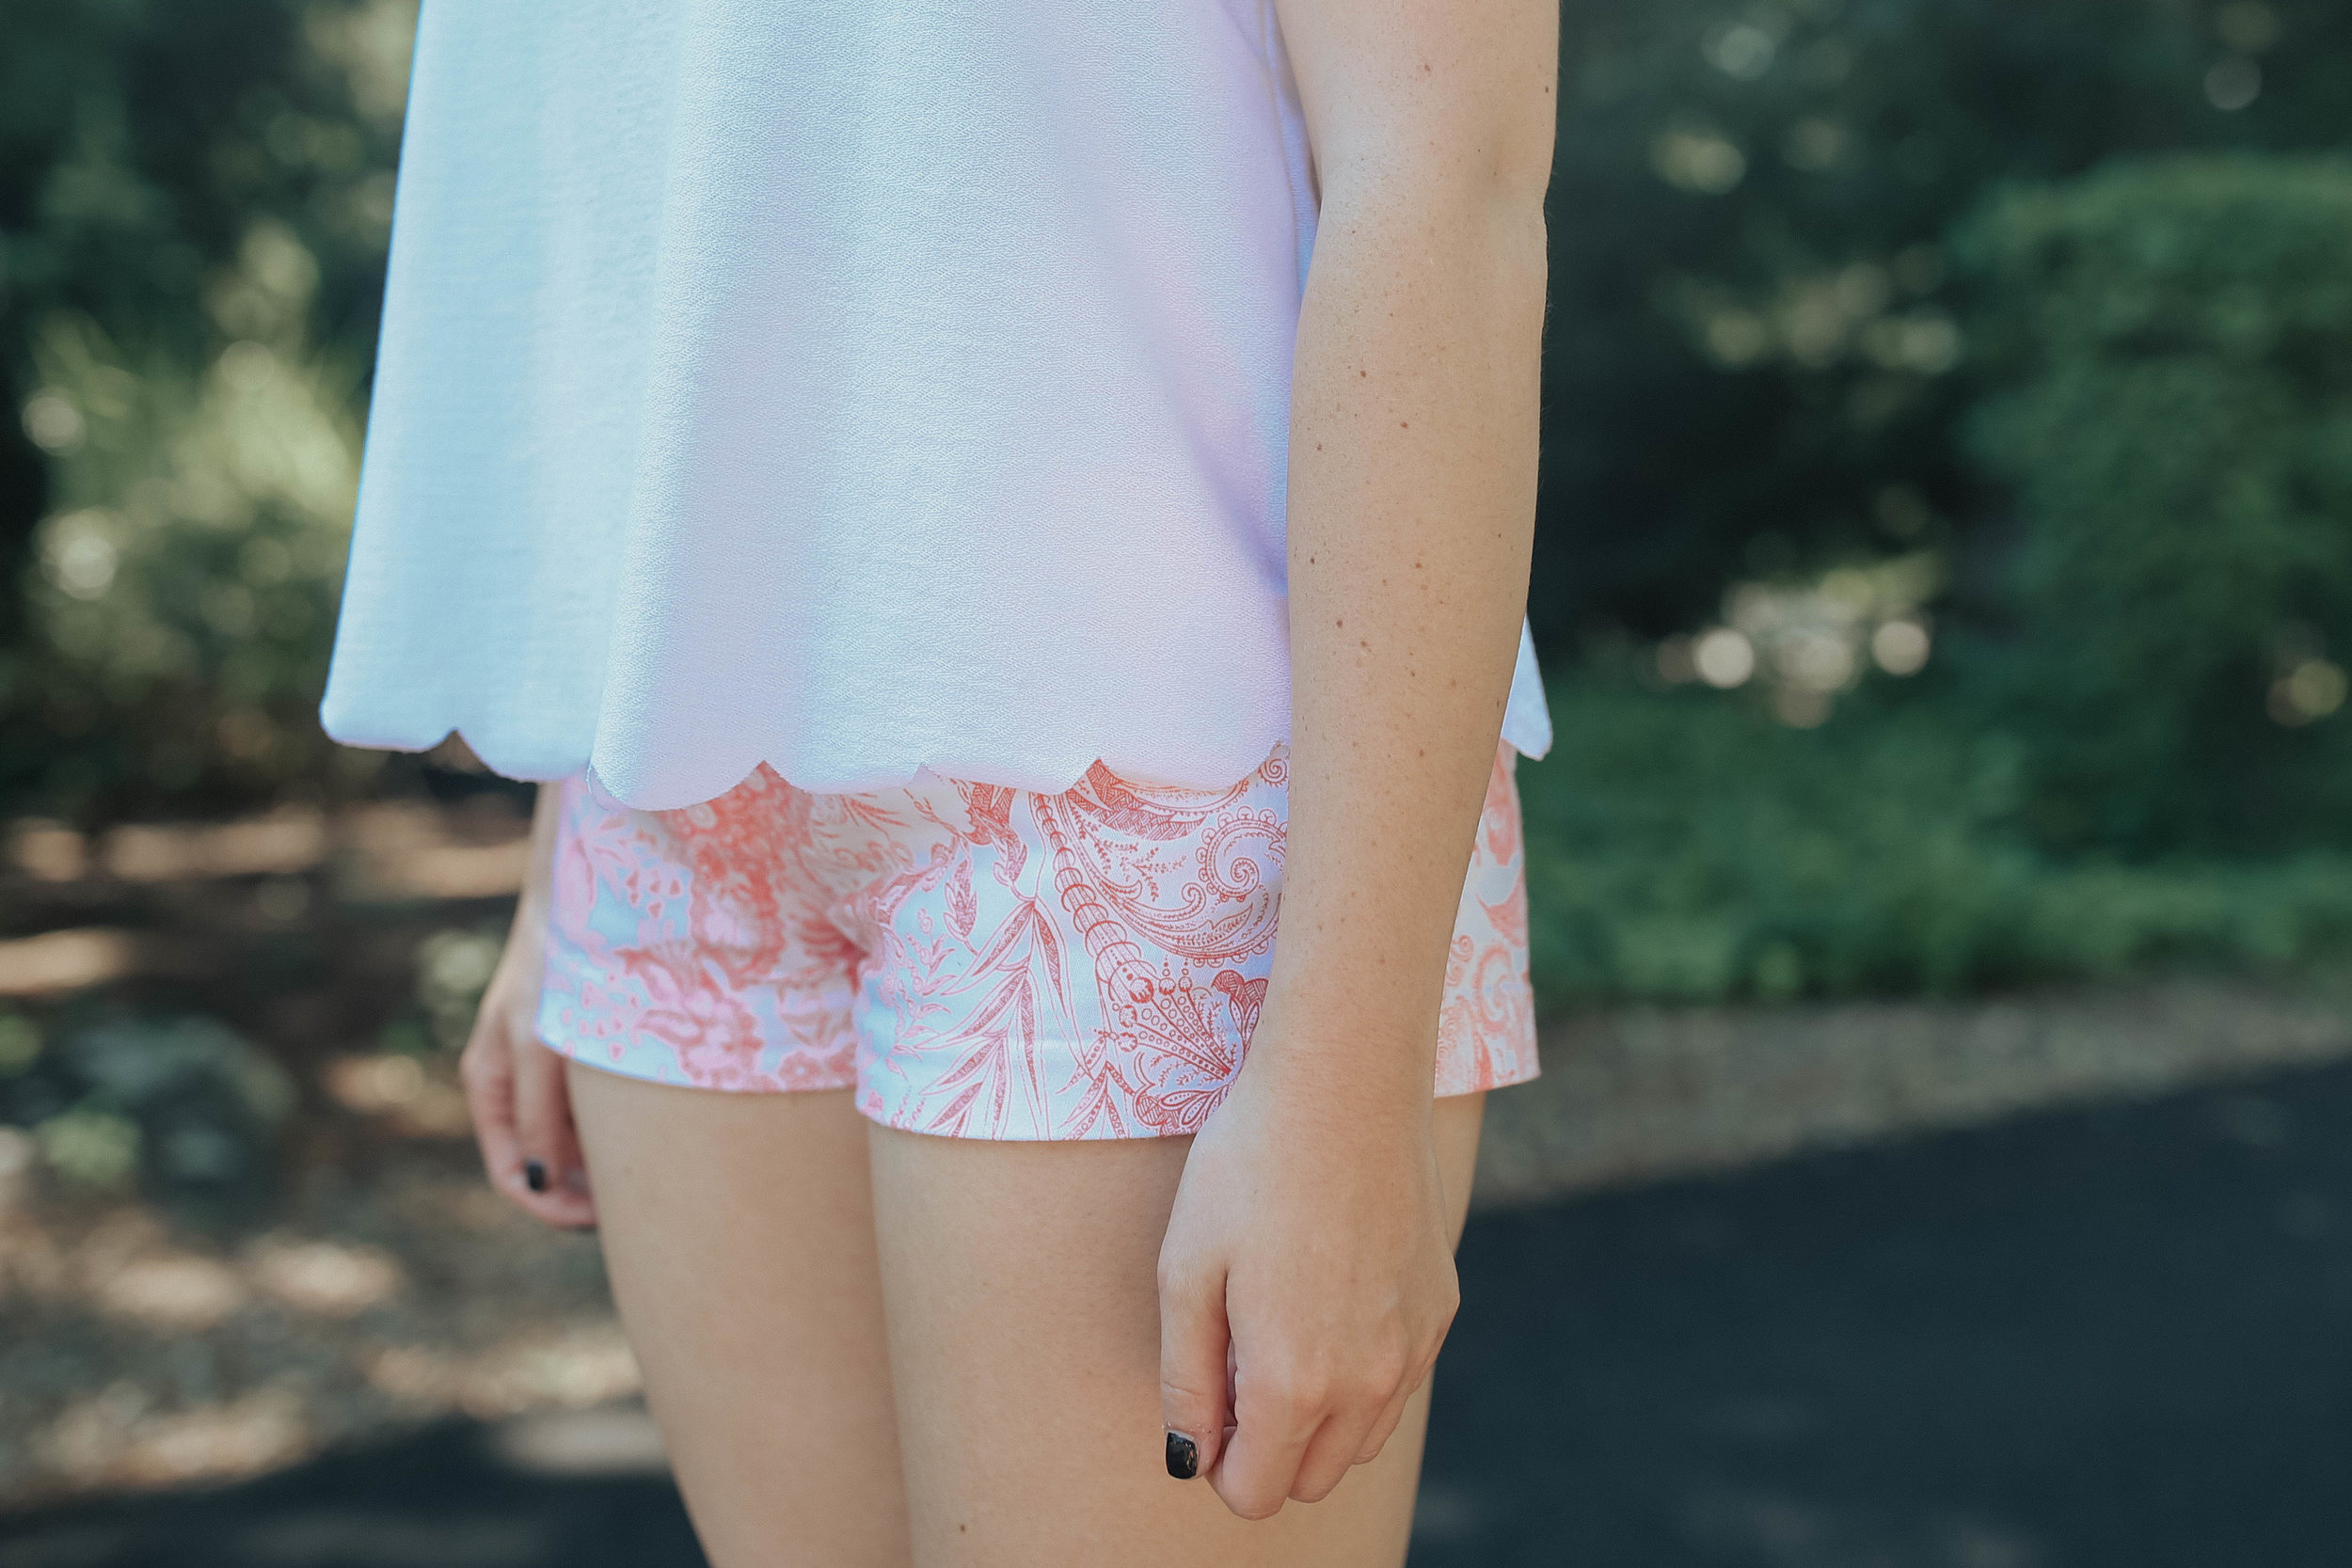 pinkshorts2.jpg